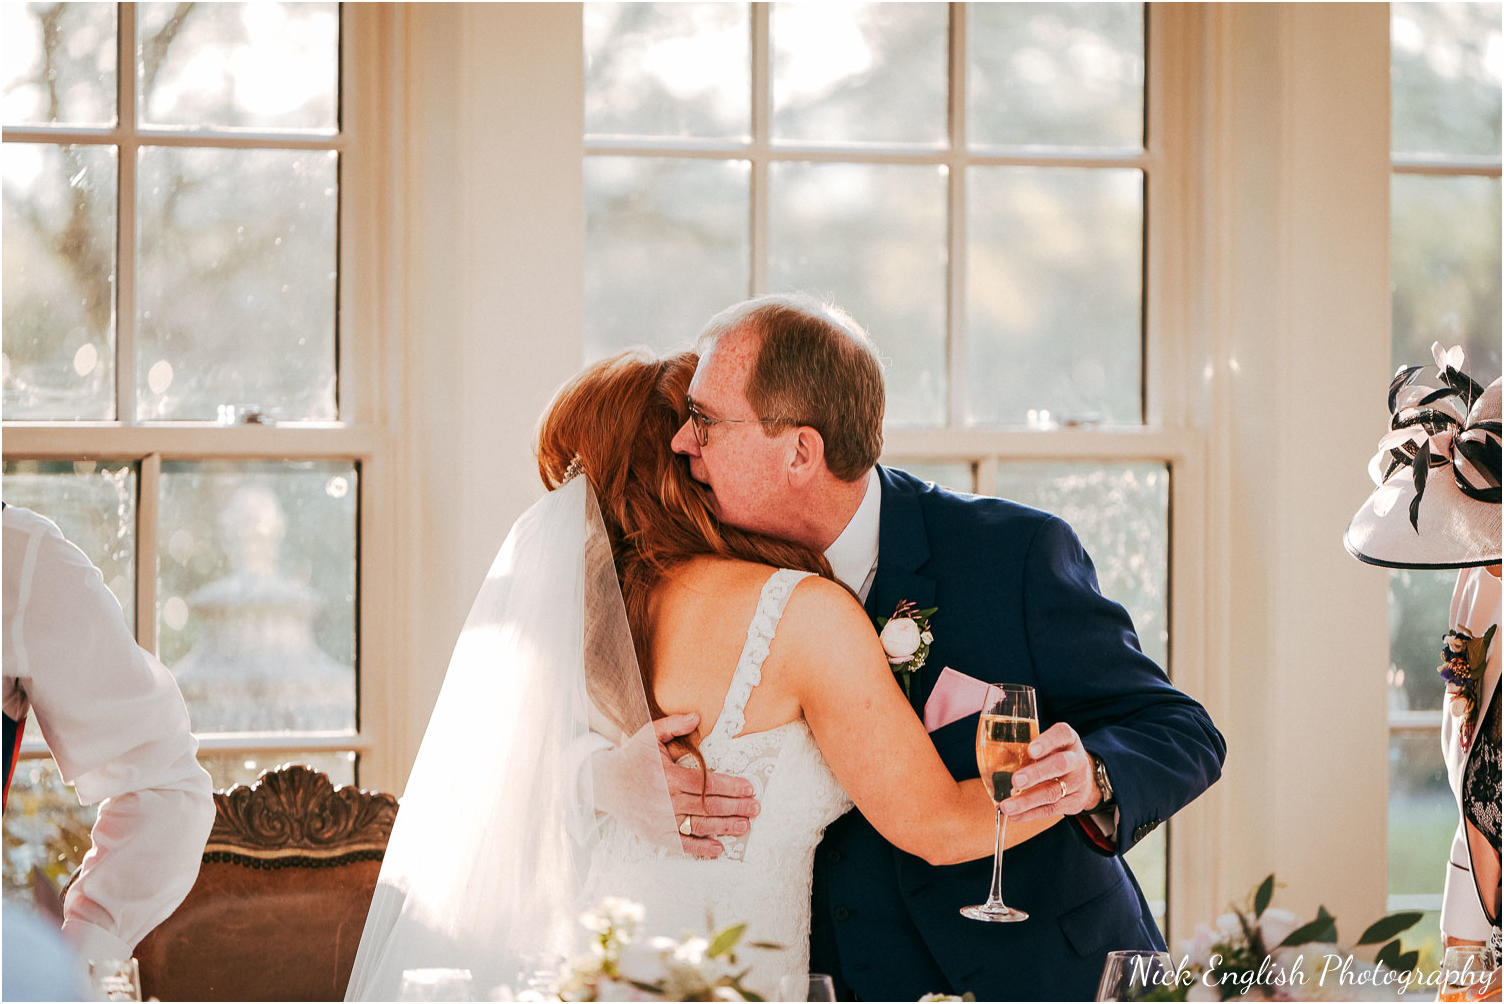 Mitton_Hall_Wedding_Photographer-164.jpg